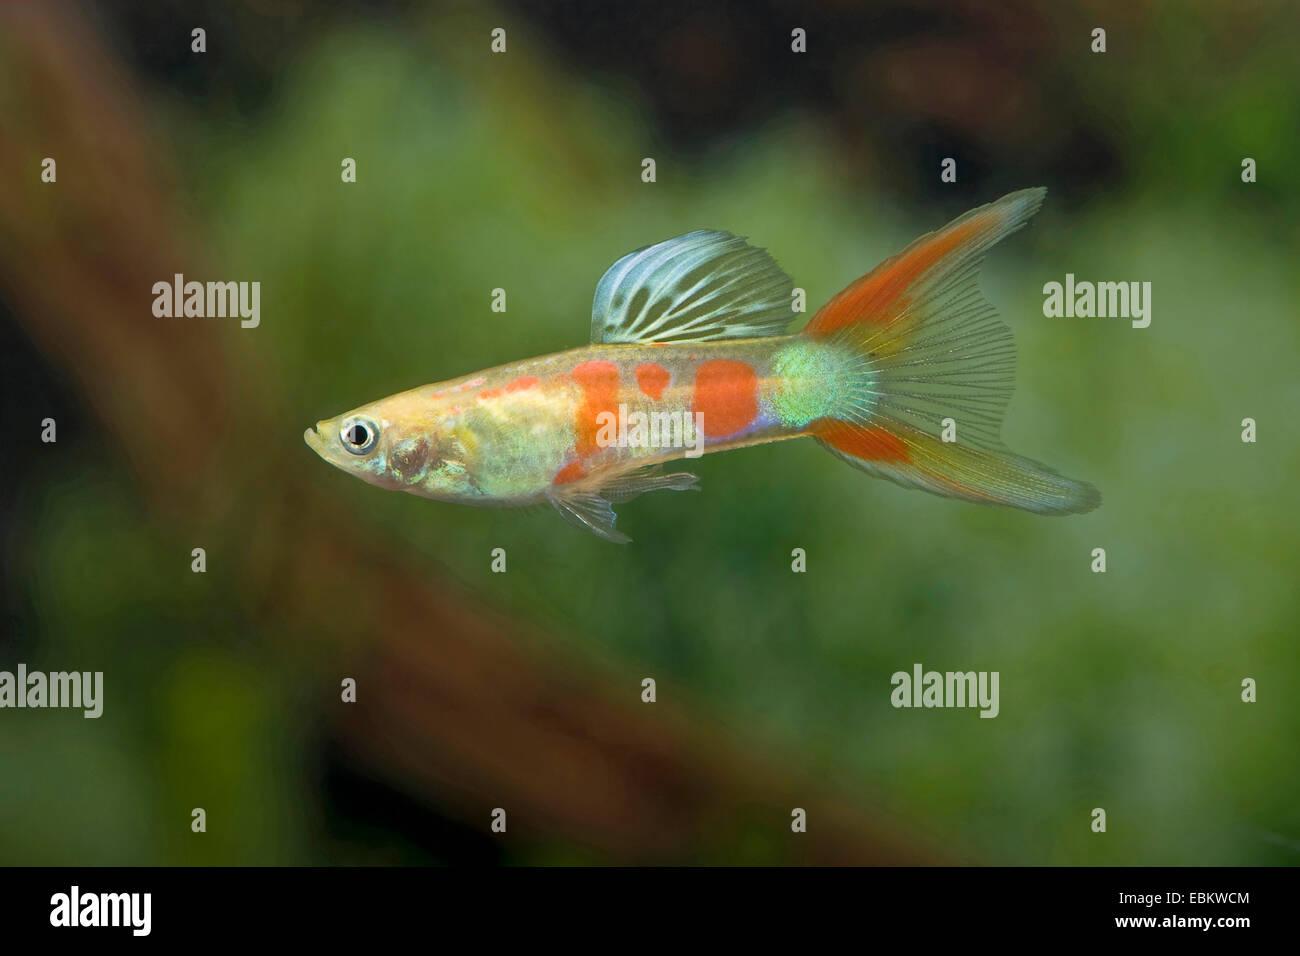 guppy (Poecilia reticulata, Lebistes reticulatus, Lebistes reticulata), breed form Rainbow Lyretail - Stock Image